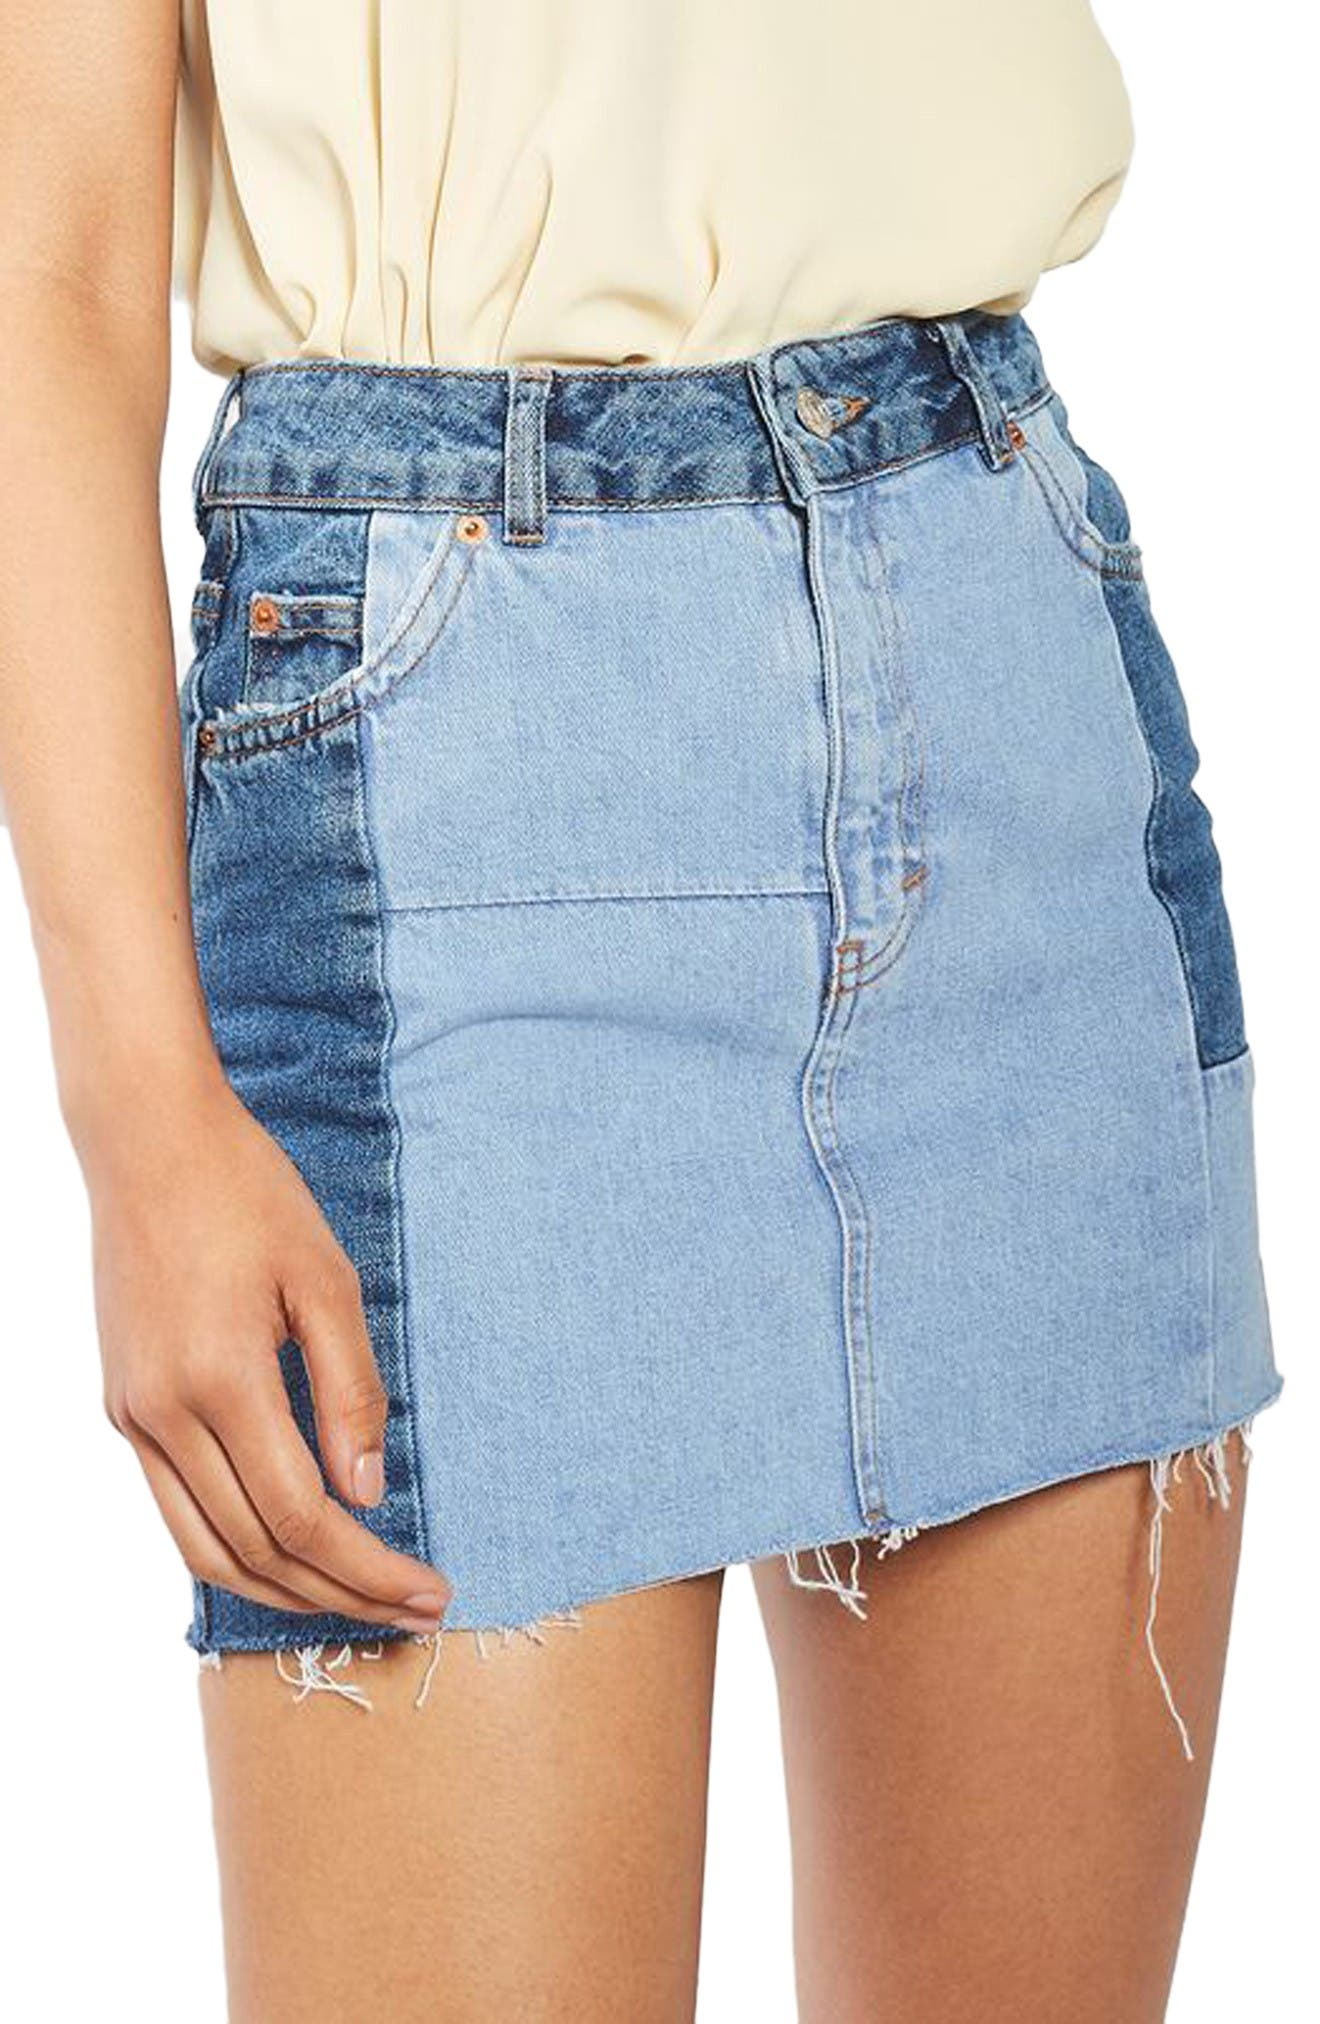 Alternate Image 1 Selected - Topshop Colorblock Denim Miniskirt